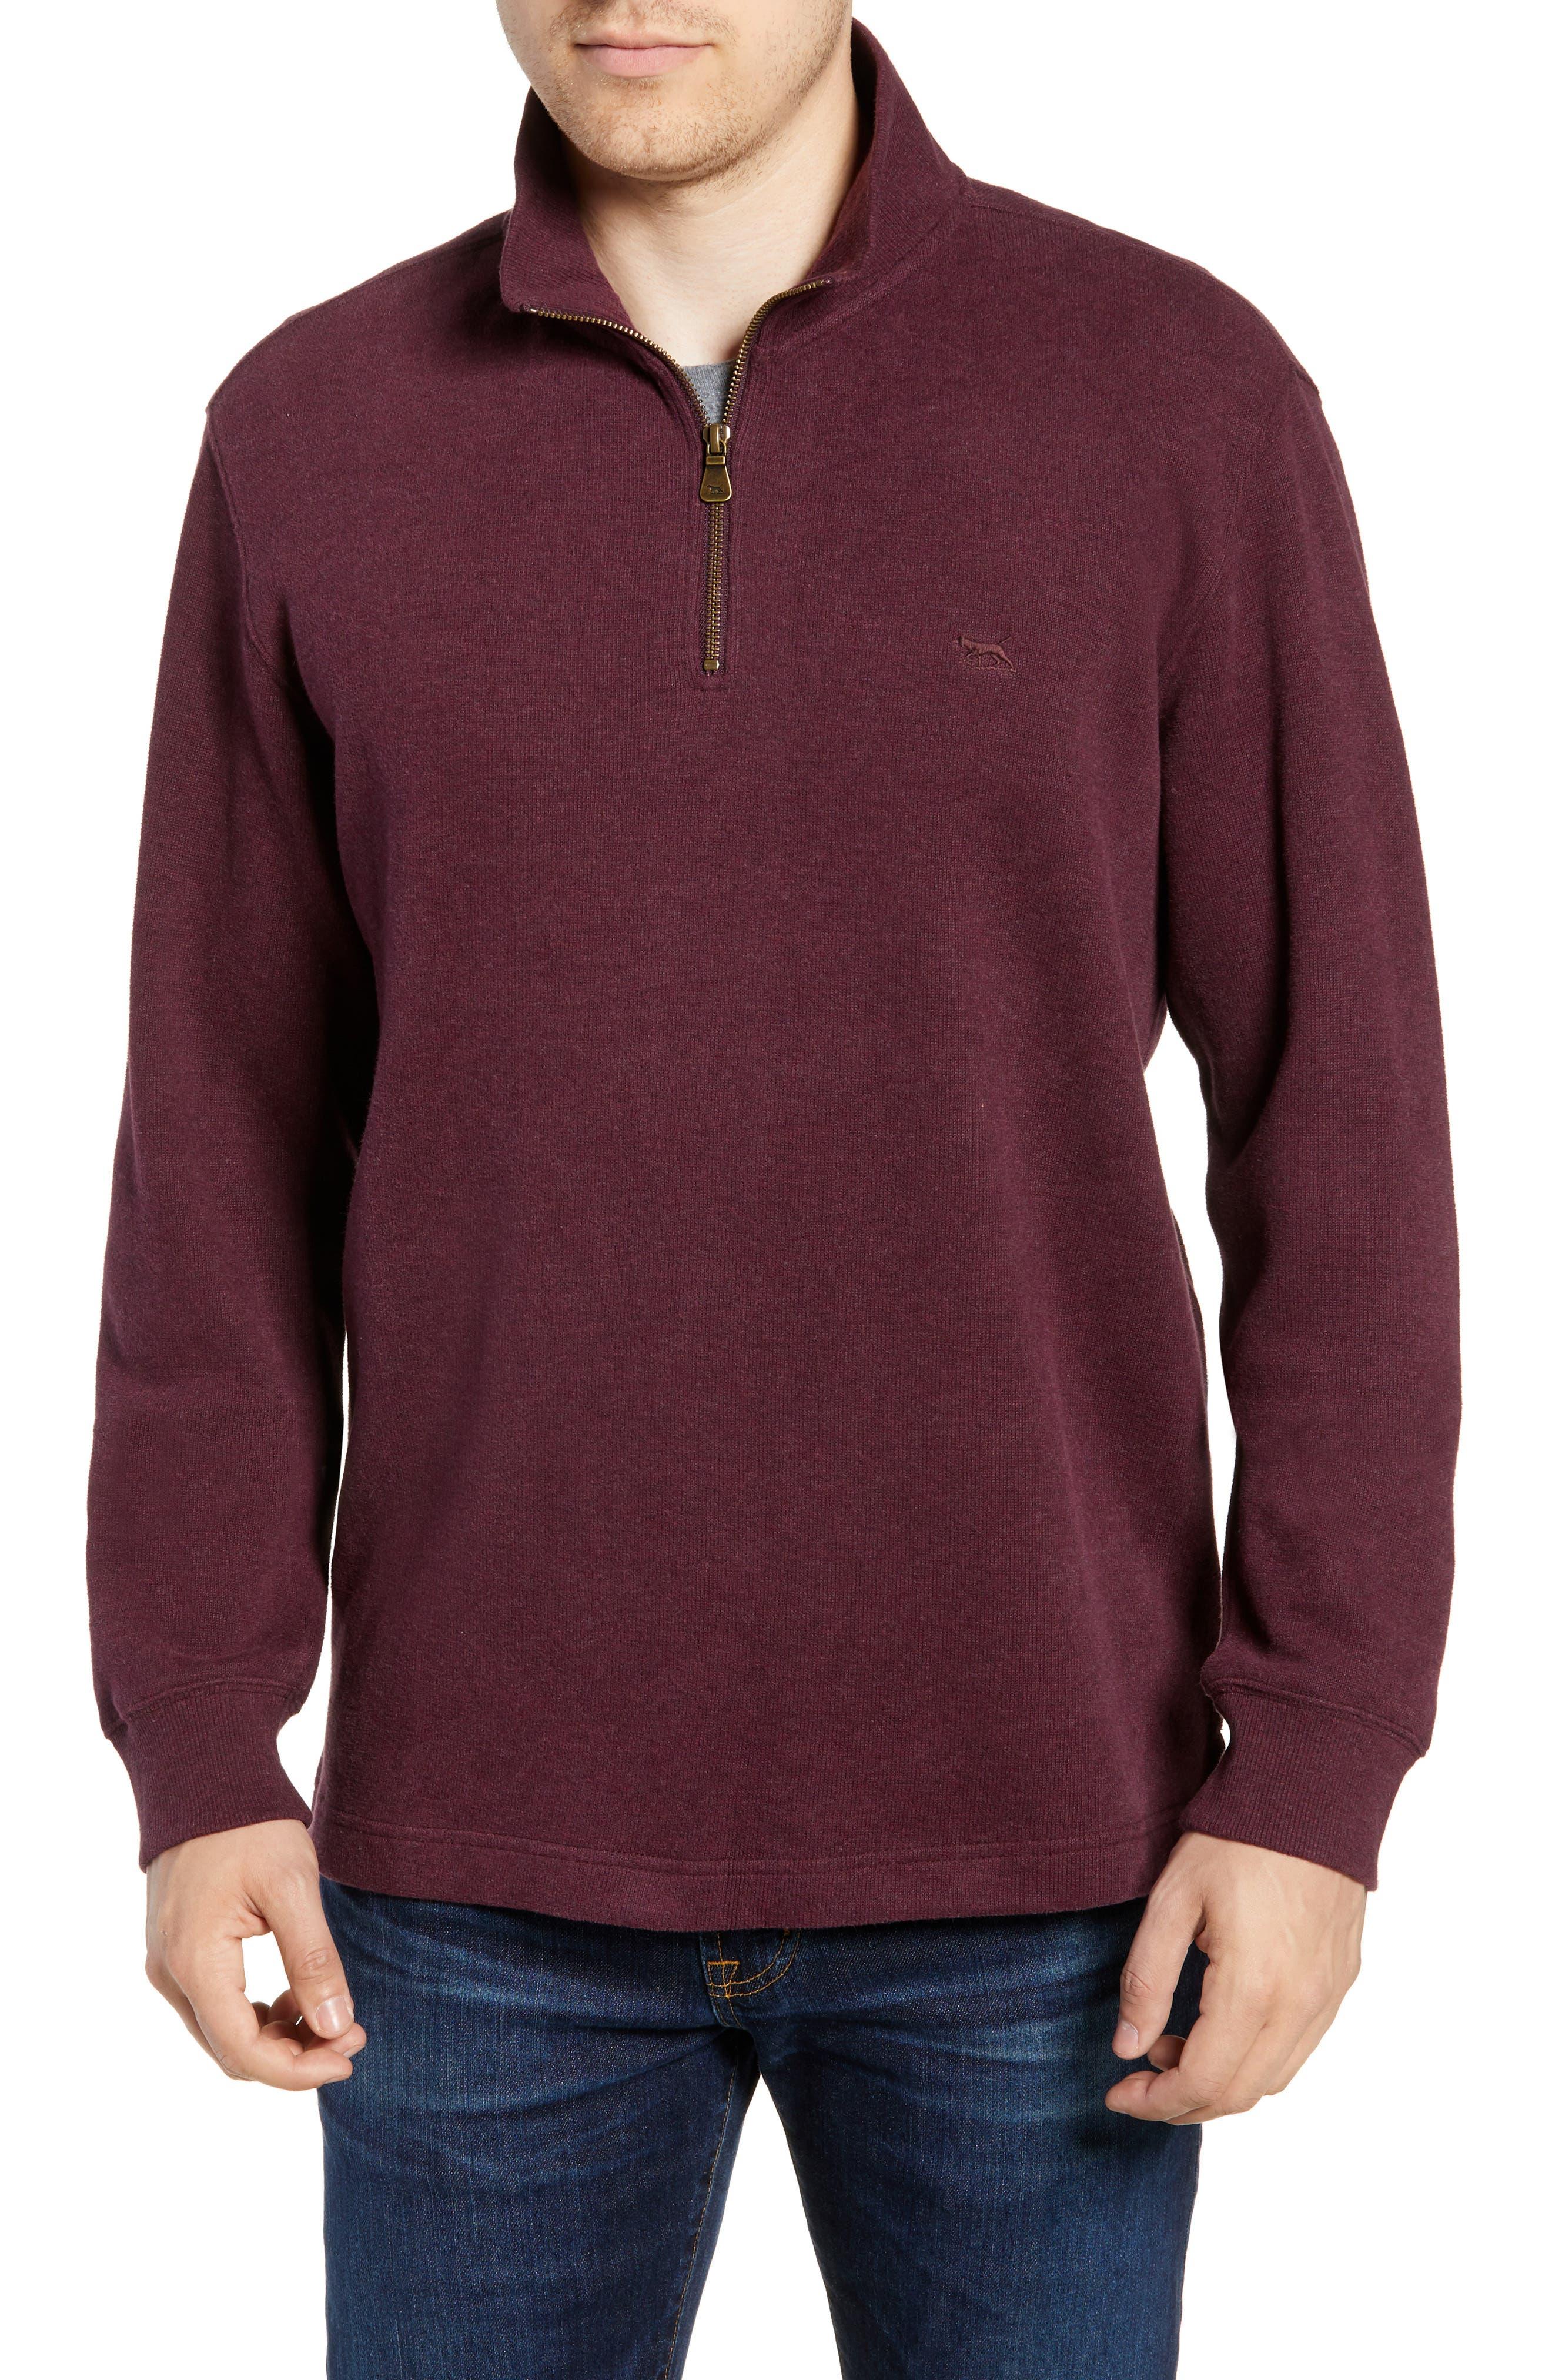 RODD & GUNN, Alton Ave Regular Fit Pullover Sweatshirt, Main thumbnail 1, color, BURGUNDY